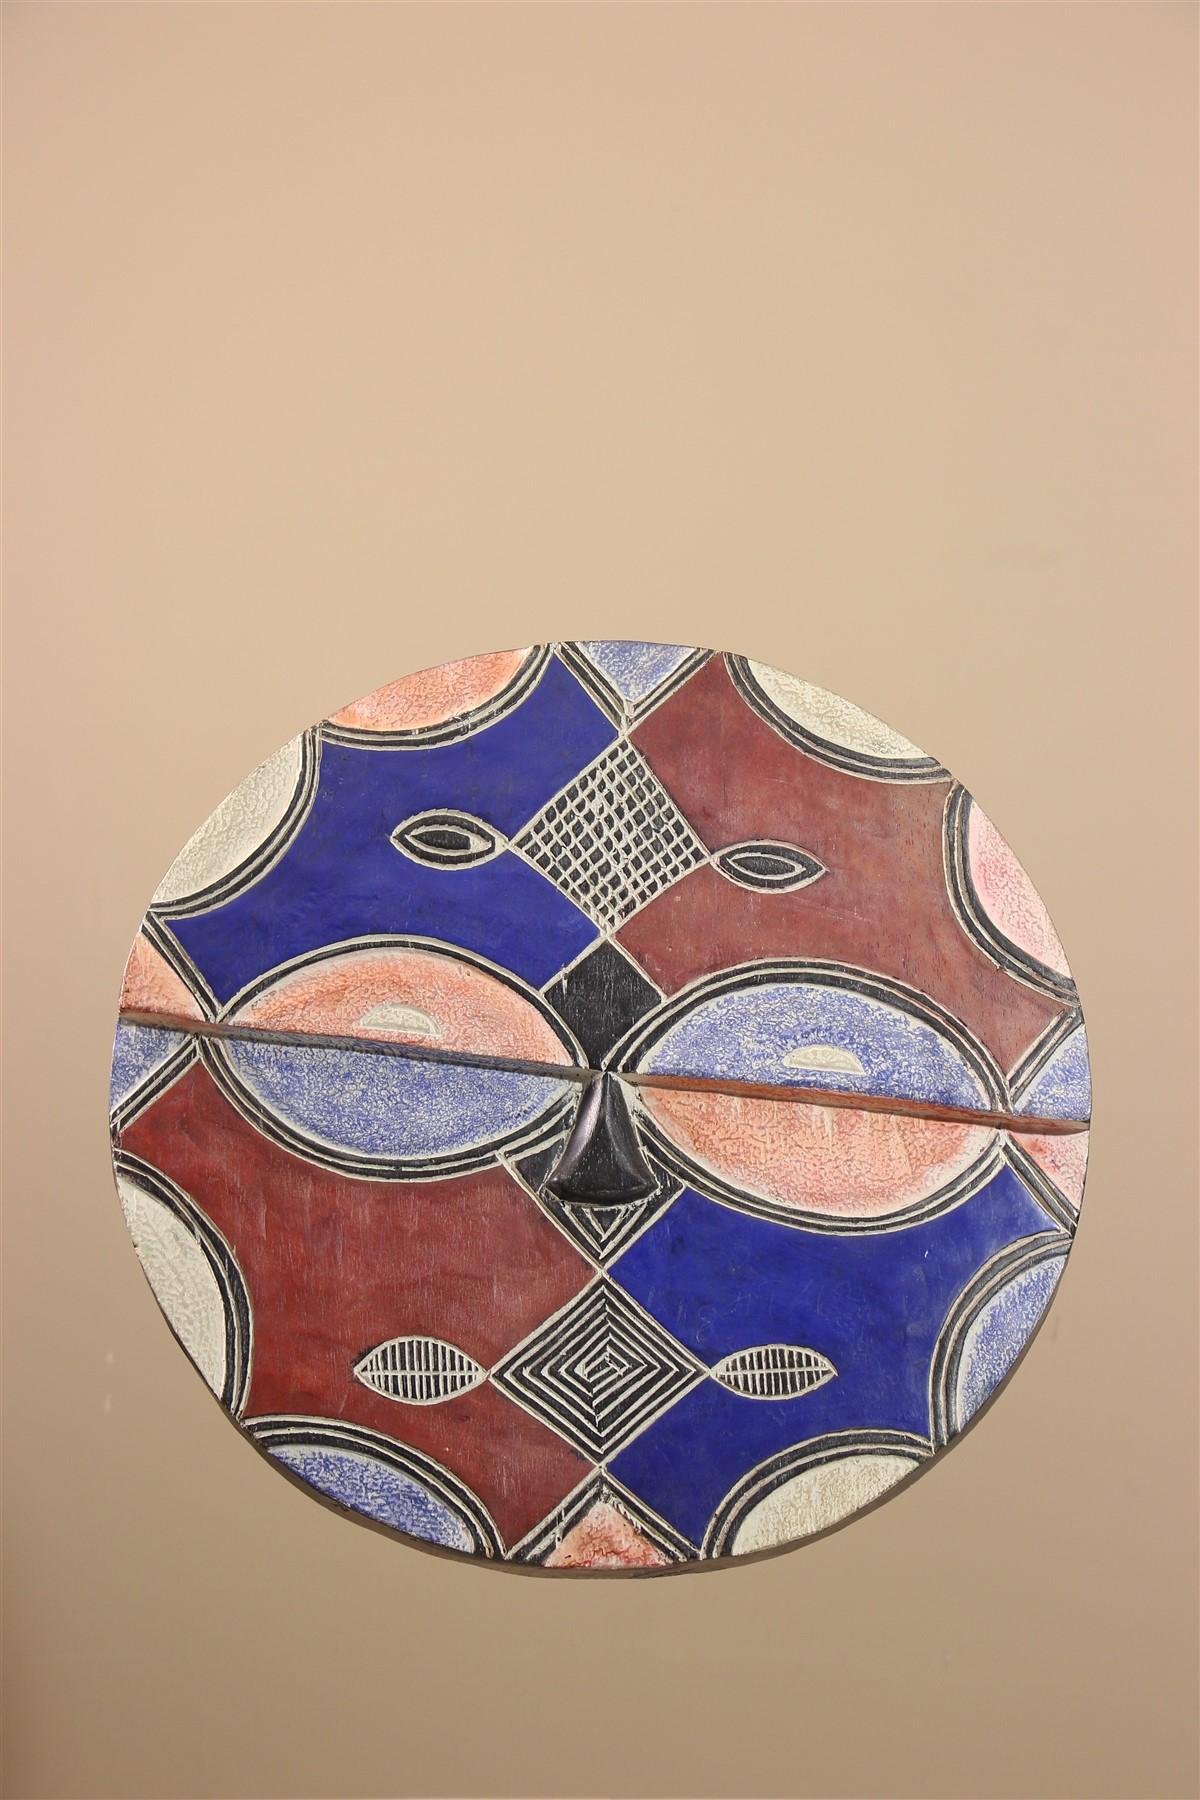 Masque africain Teke Idumu - Déco africaine - Art africain traditionnel